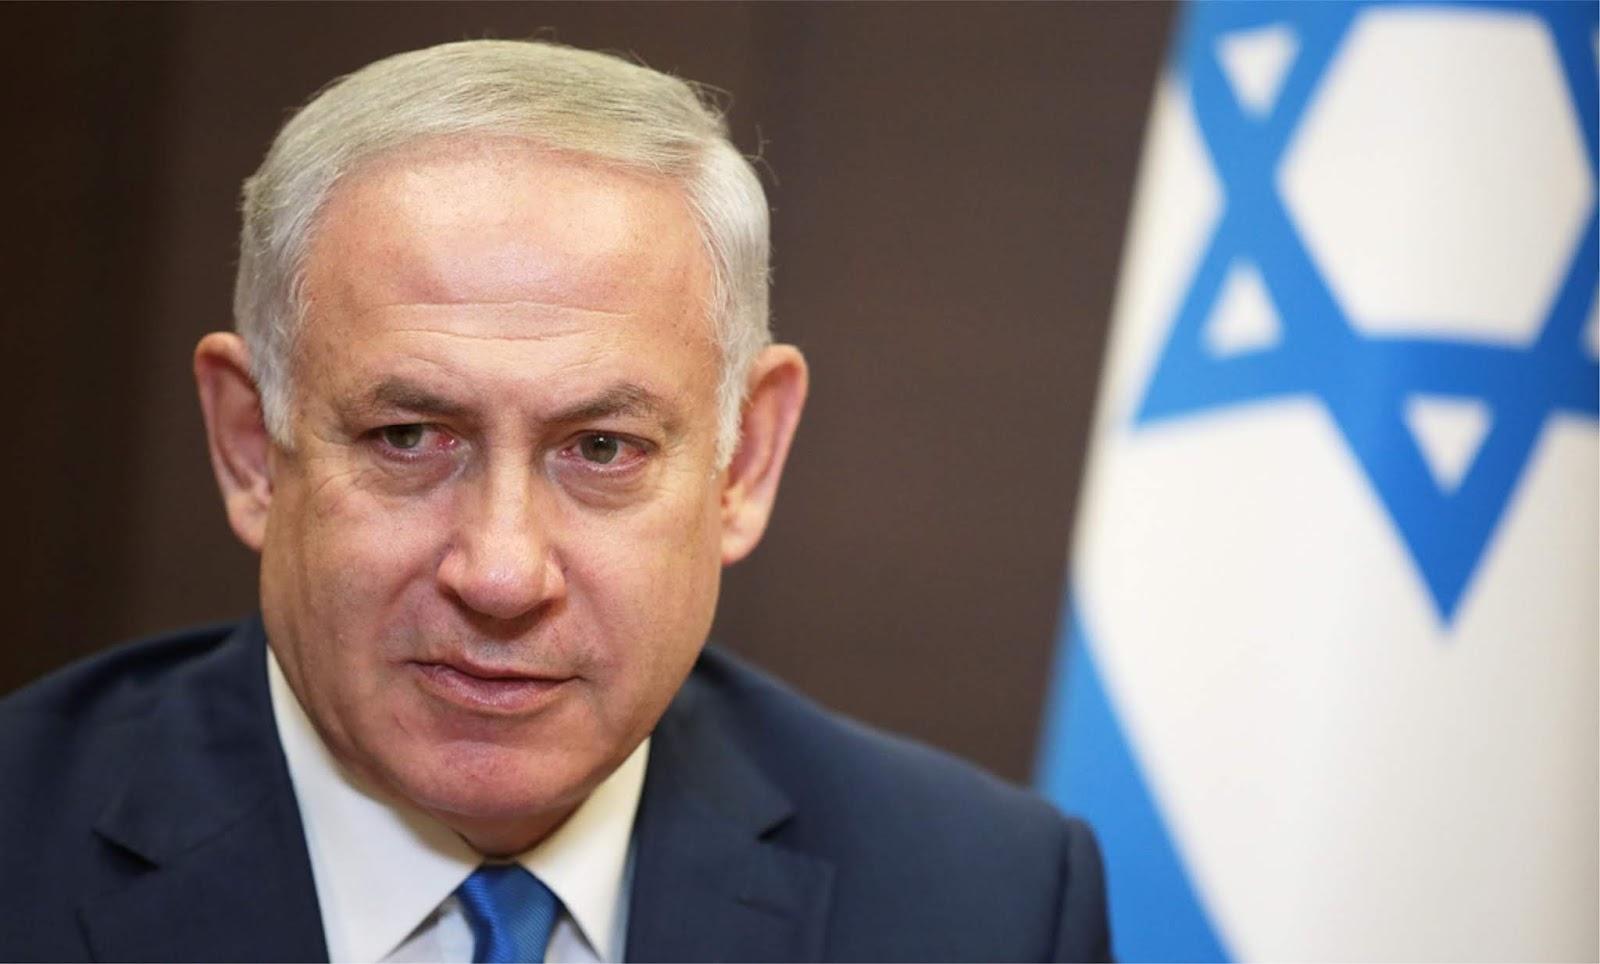 Netanyahu Merangka Menjadi Menteri Pertahanan Israel setelah pengunduran diri Lieberman